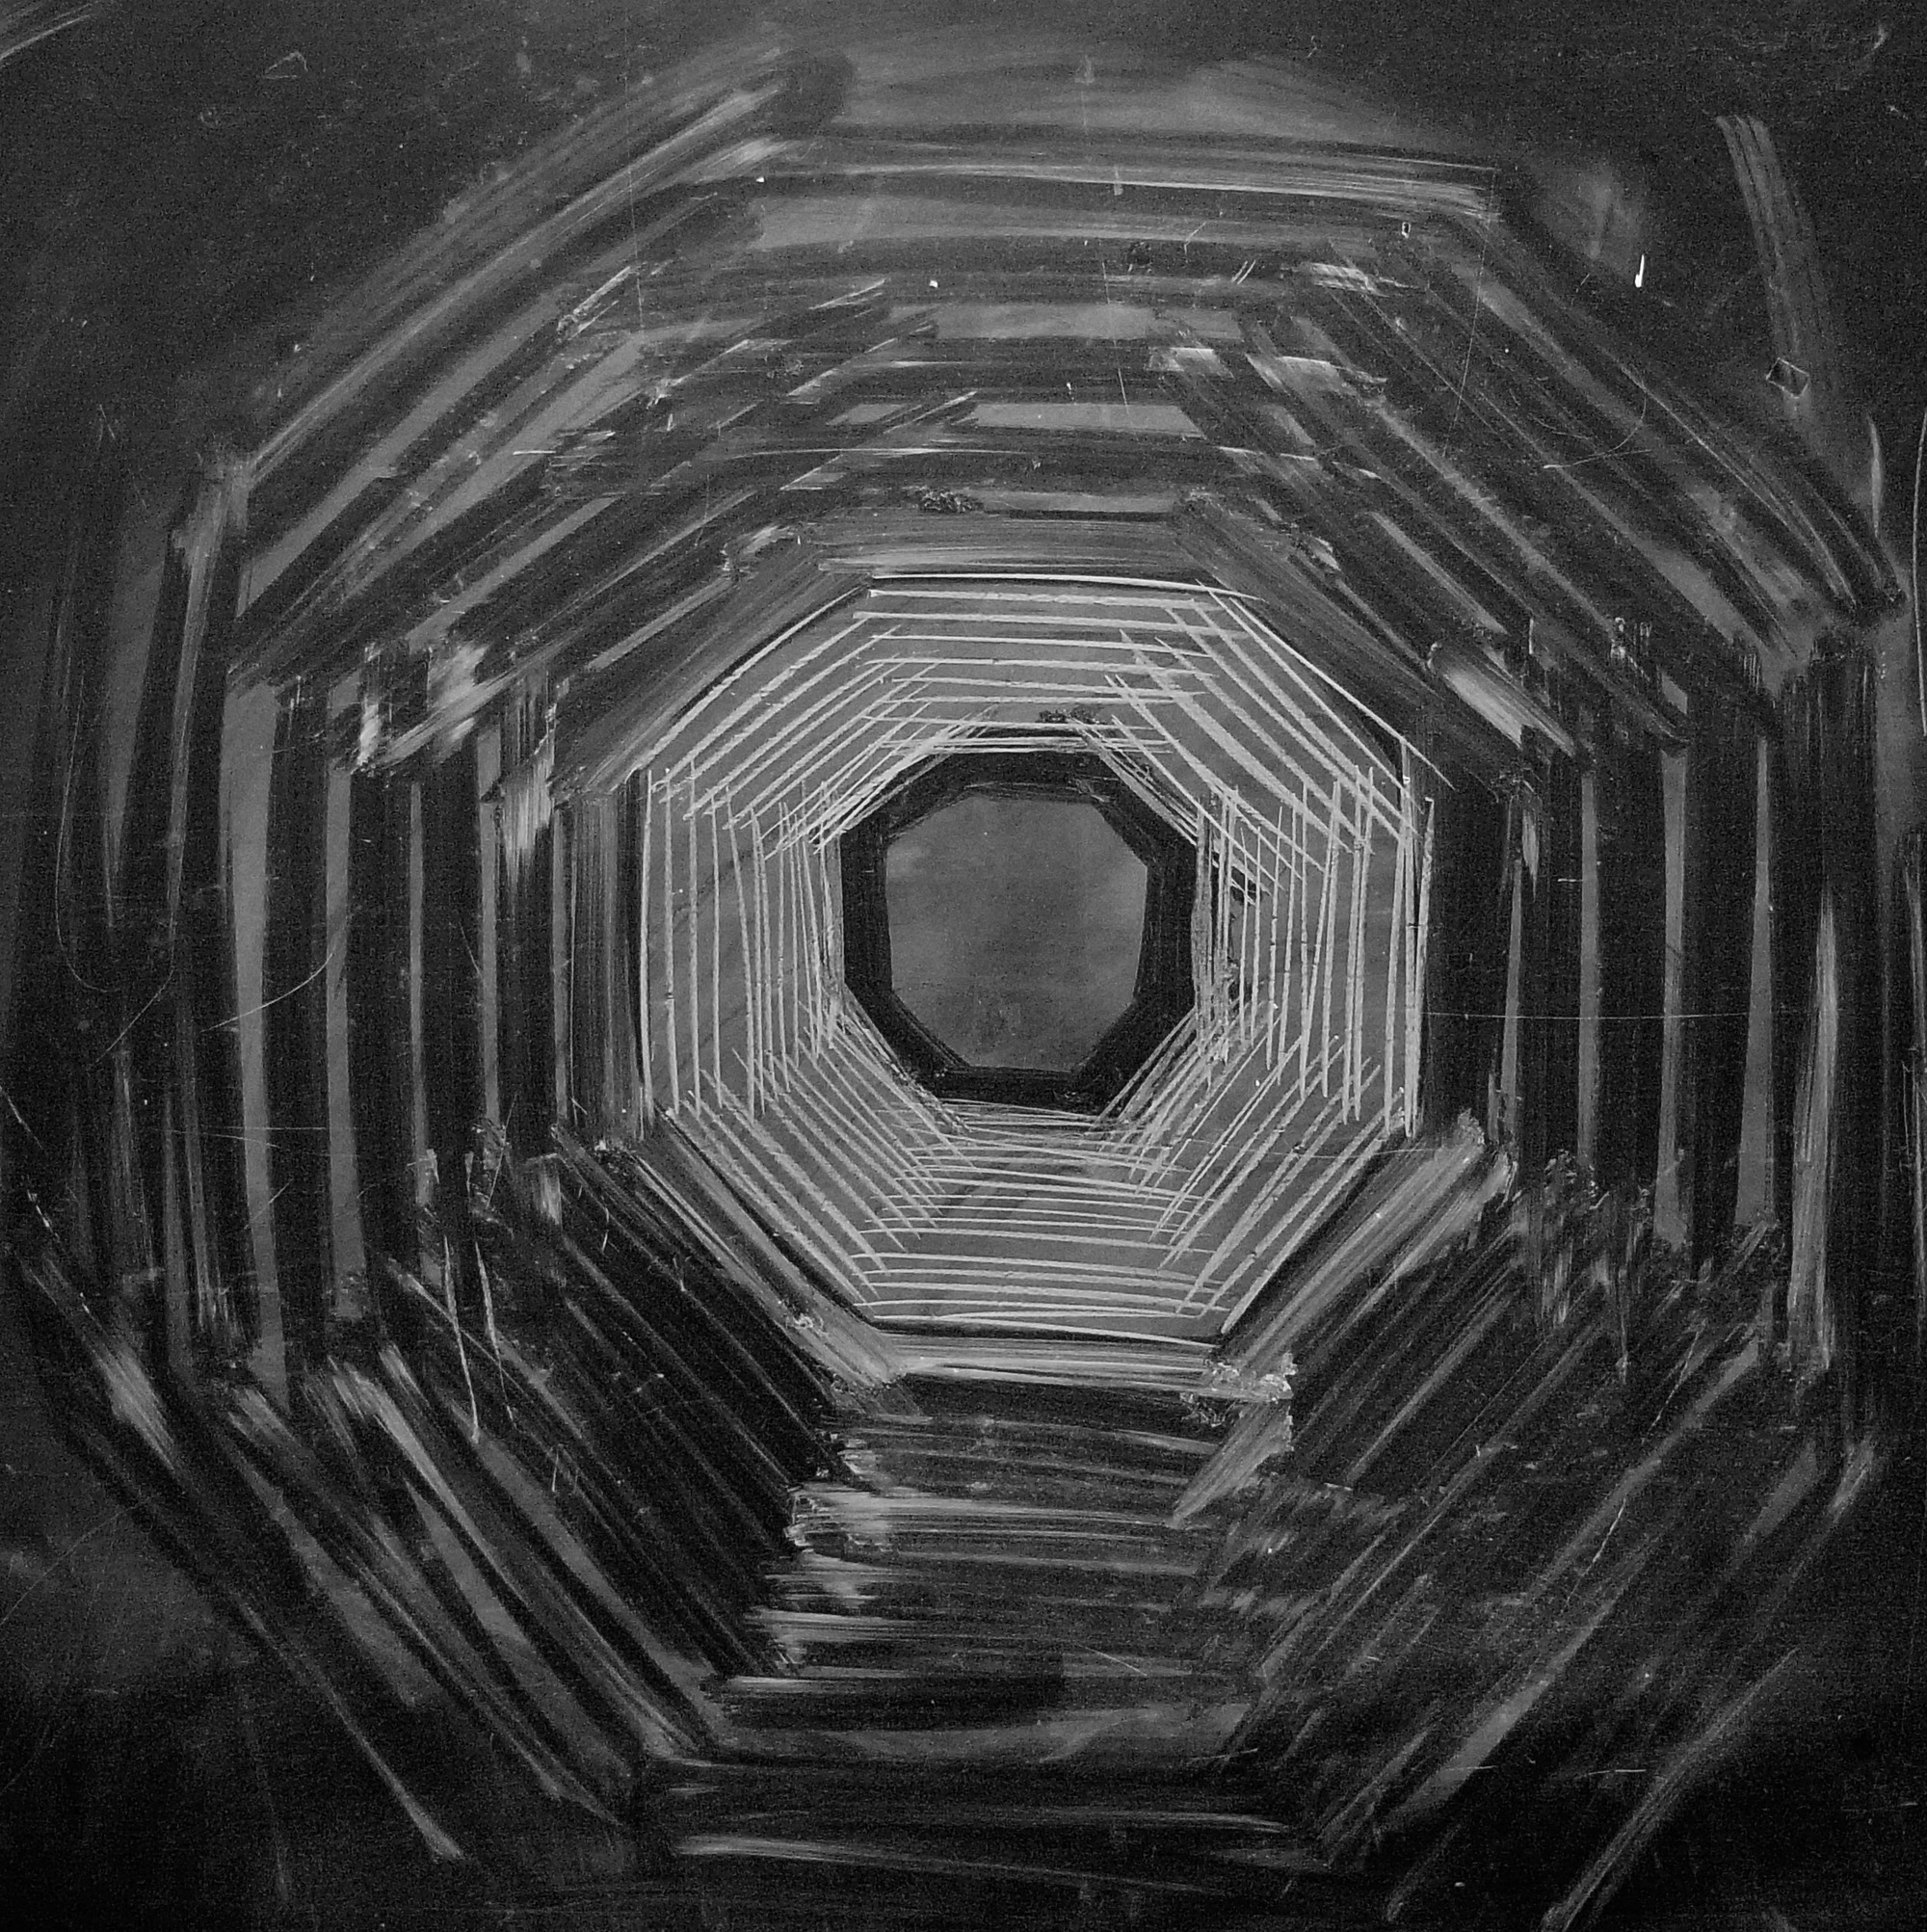 Octagonal Space